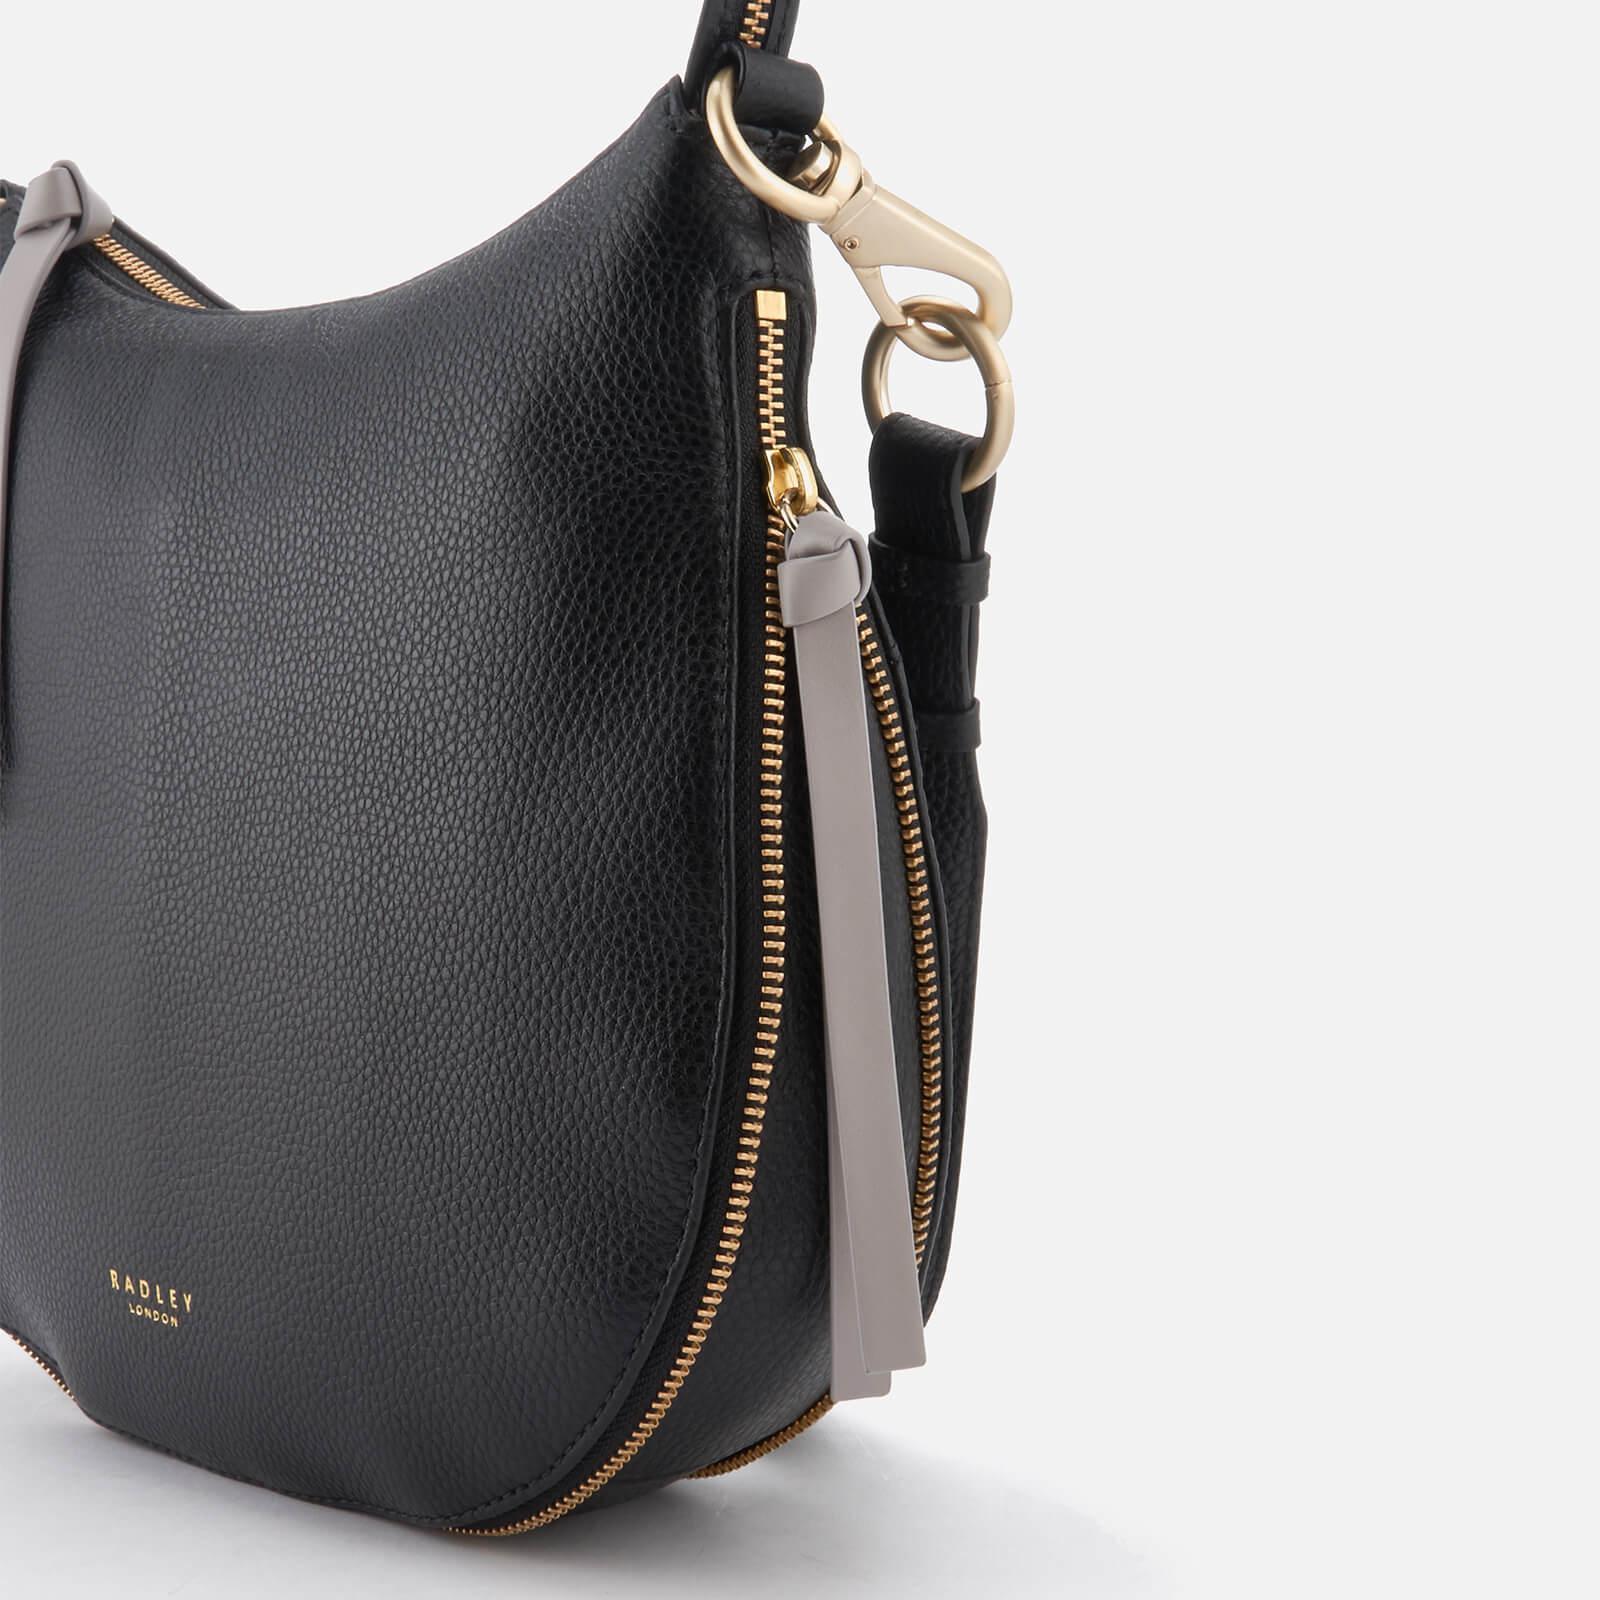 Radley Leather Pudding Lane Large Ziptop Cross Body Bag in Black